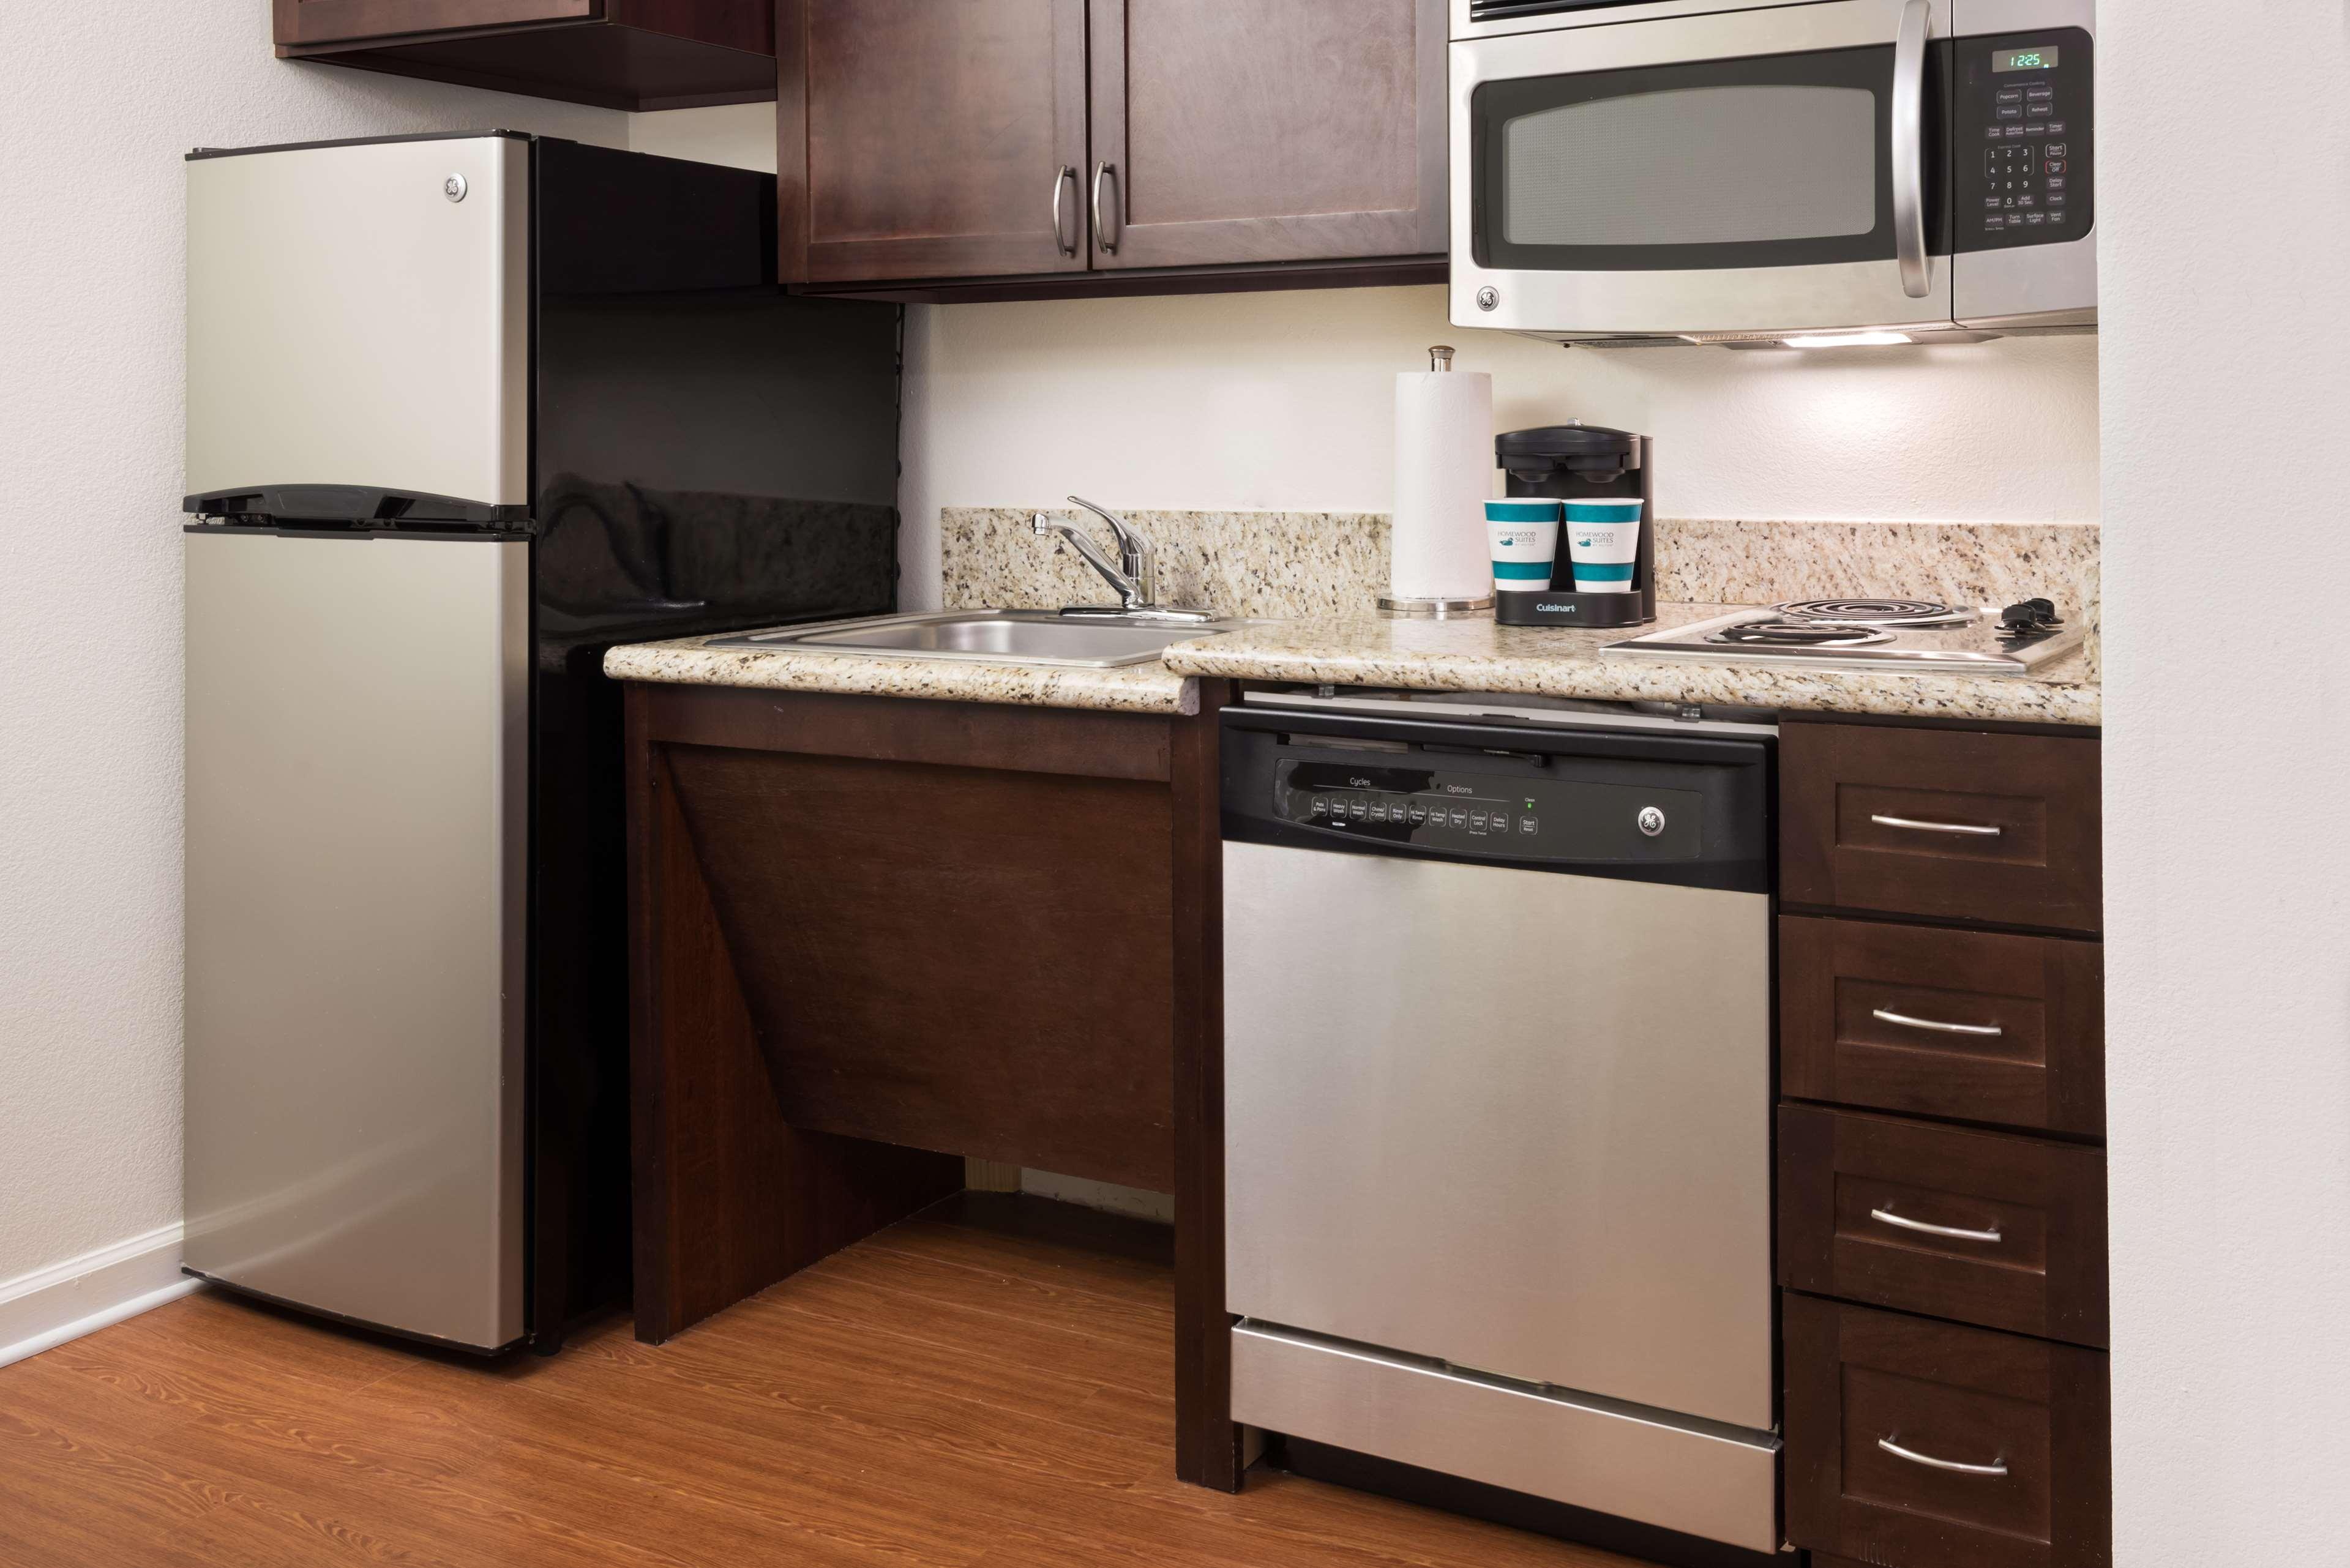 Homewood Suites by Hilton Charlotte-North/Univ Research Park image 9